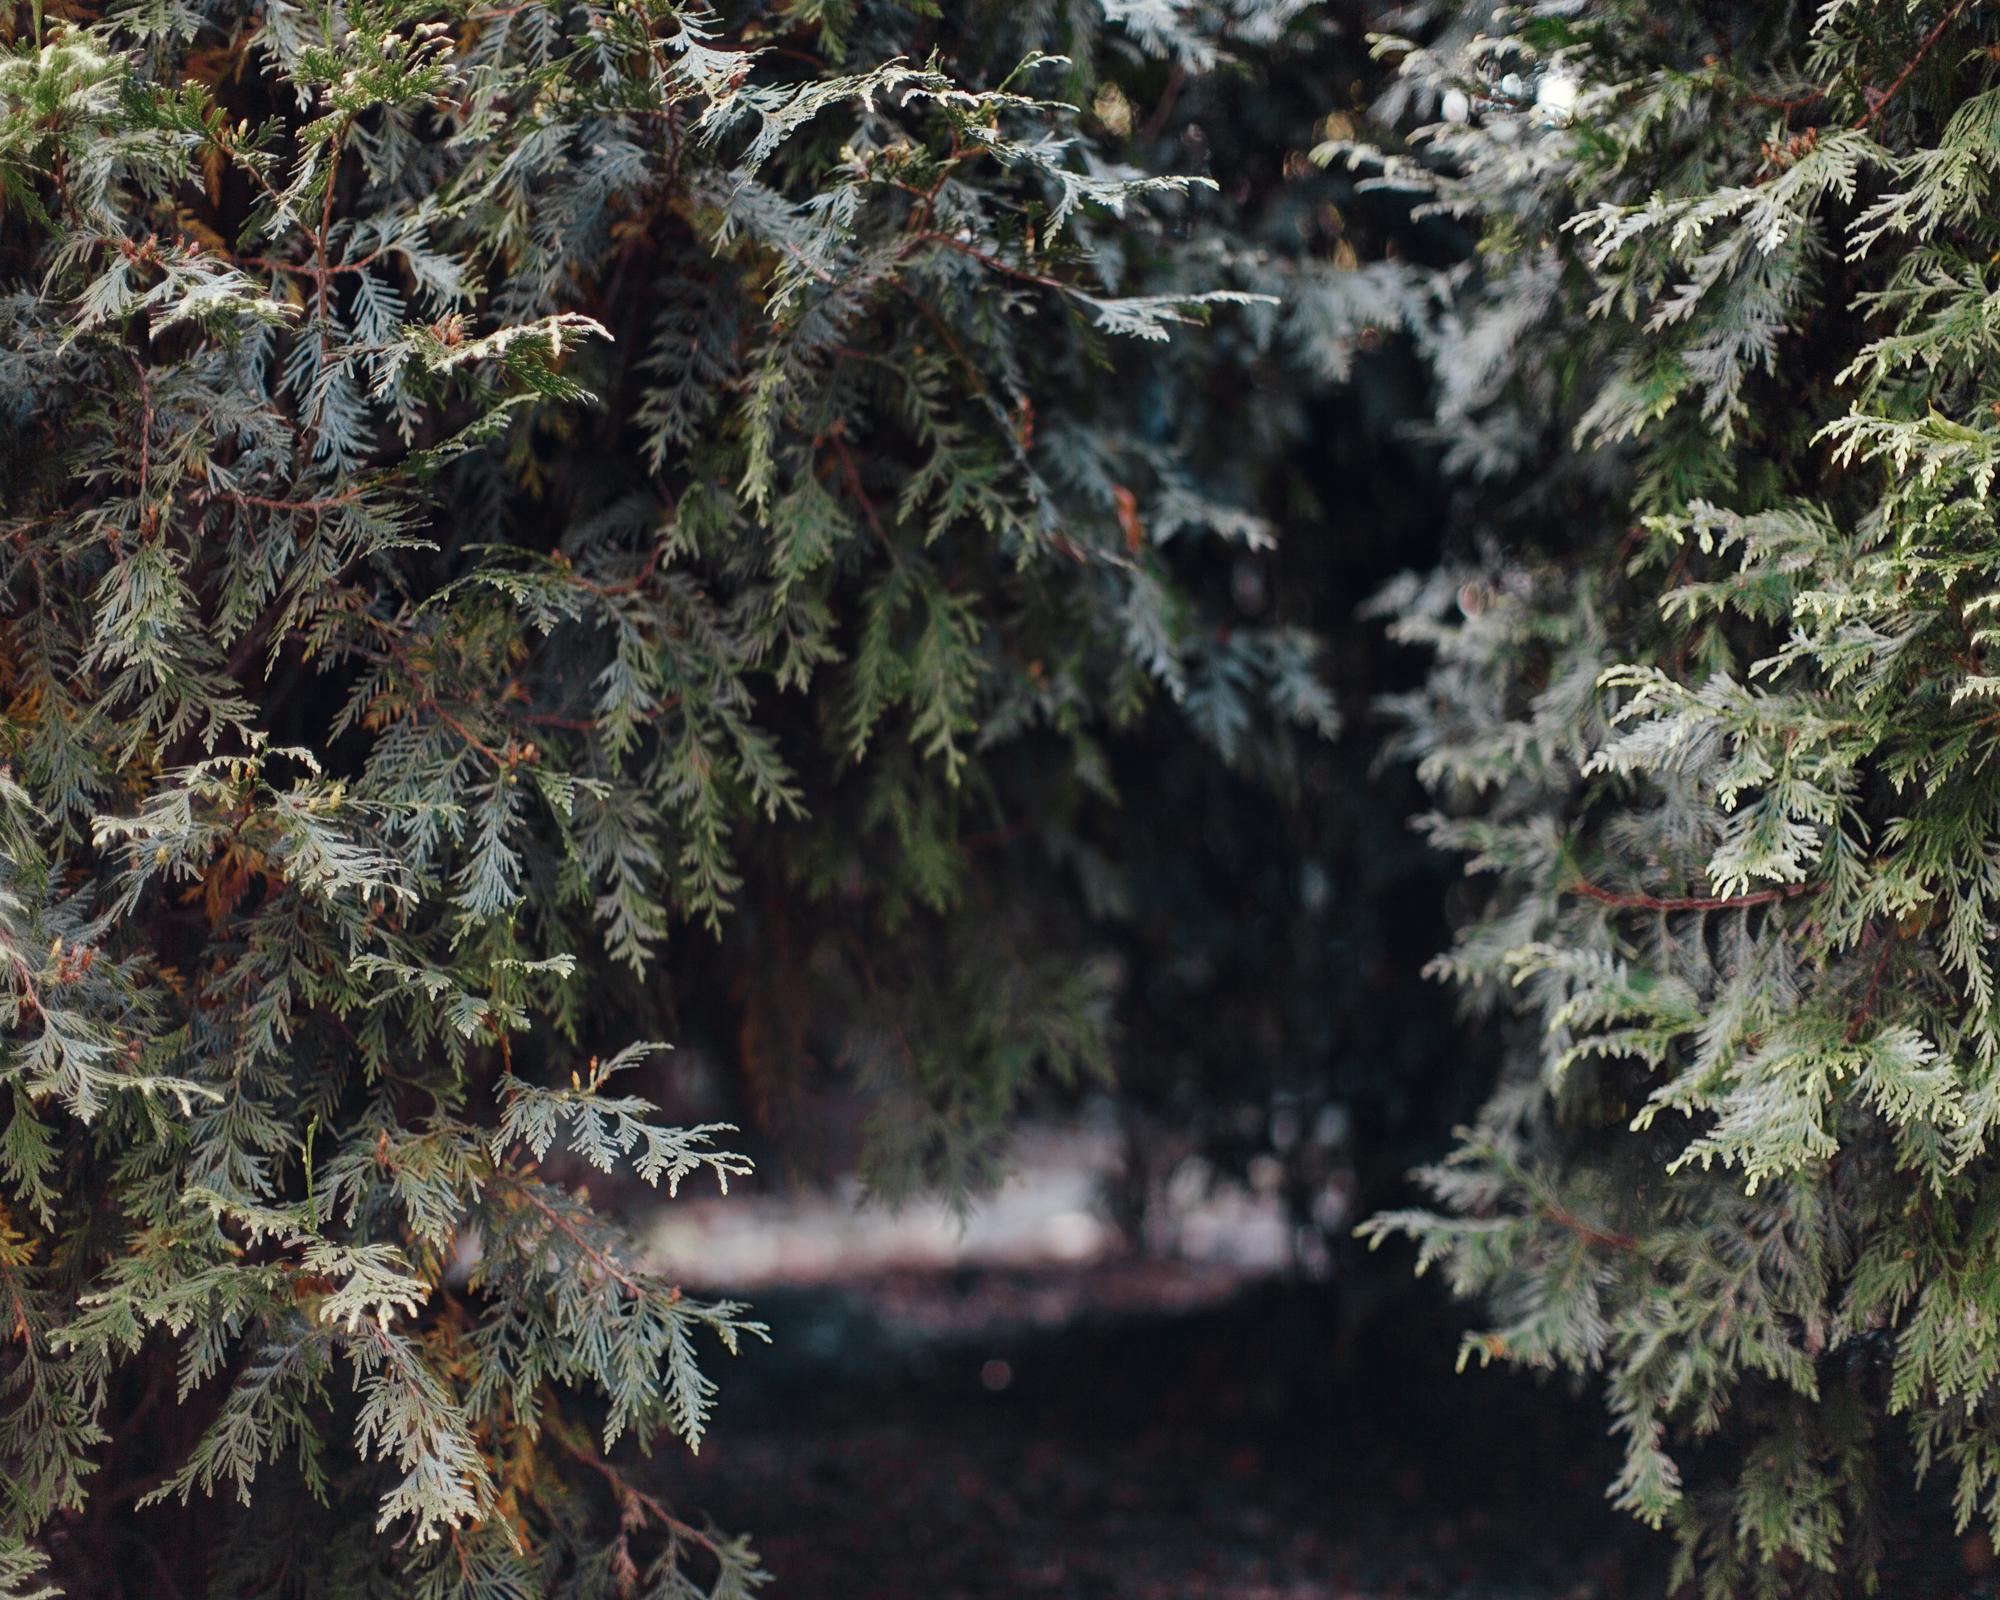 ForestOfLorien_HollinHills_CarolineSpace_Caroline-Space_005.jpg